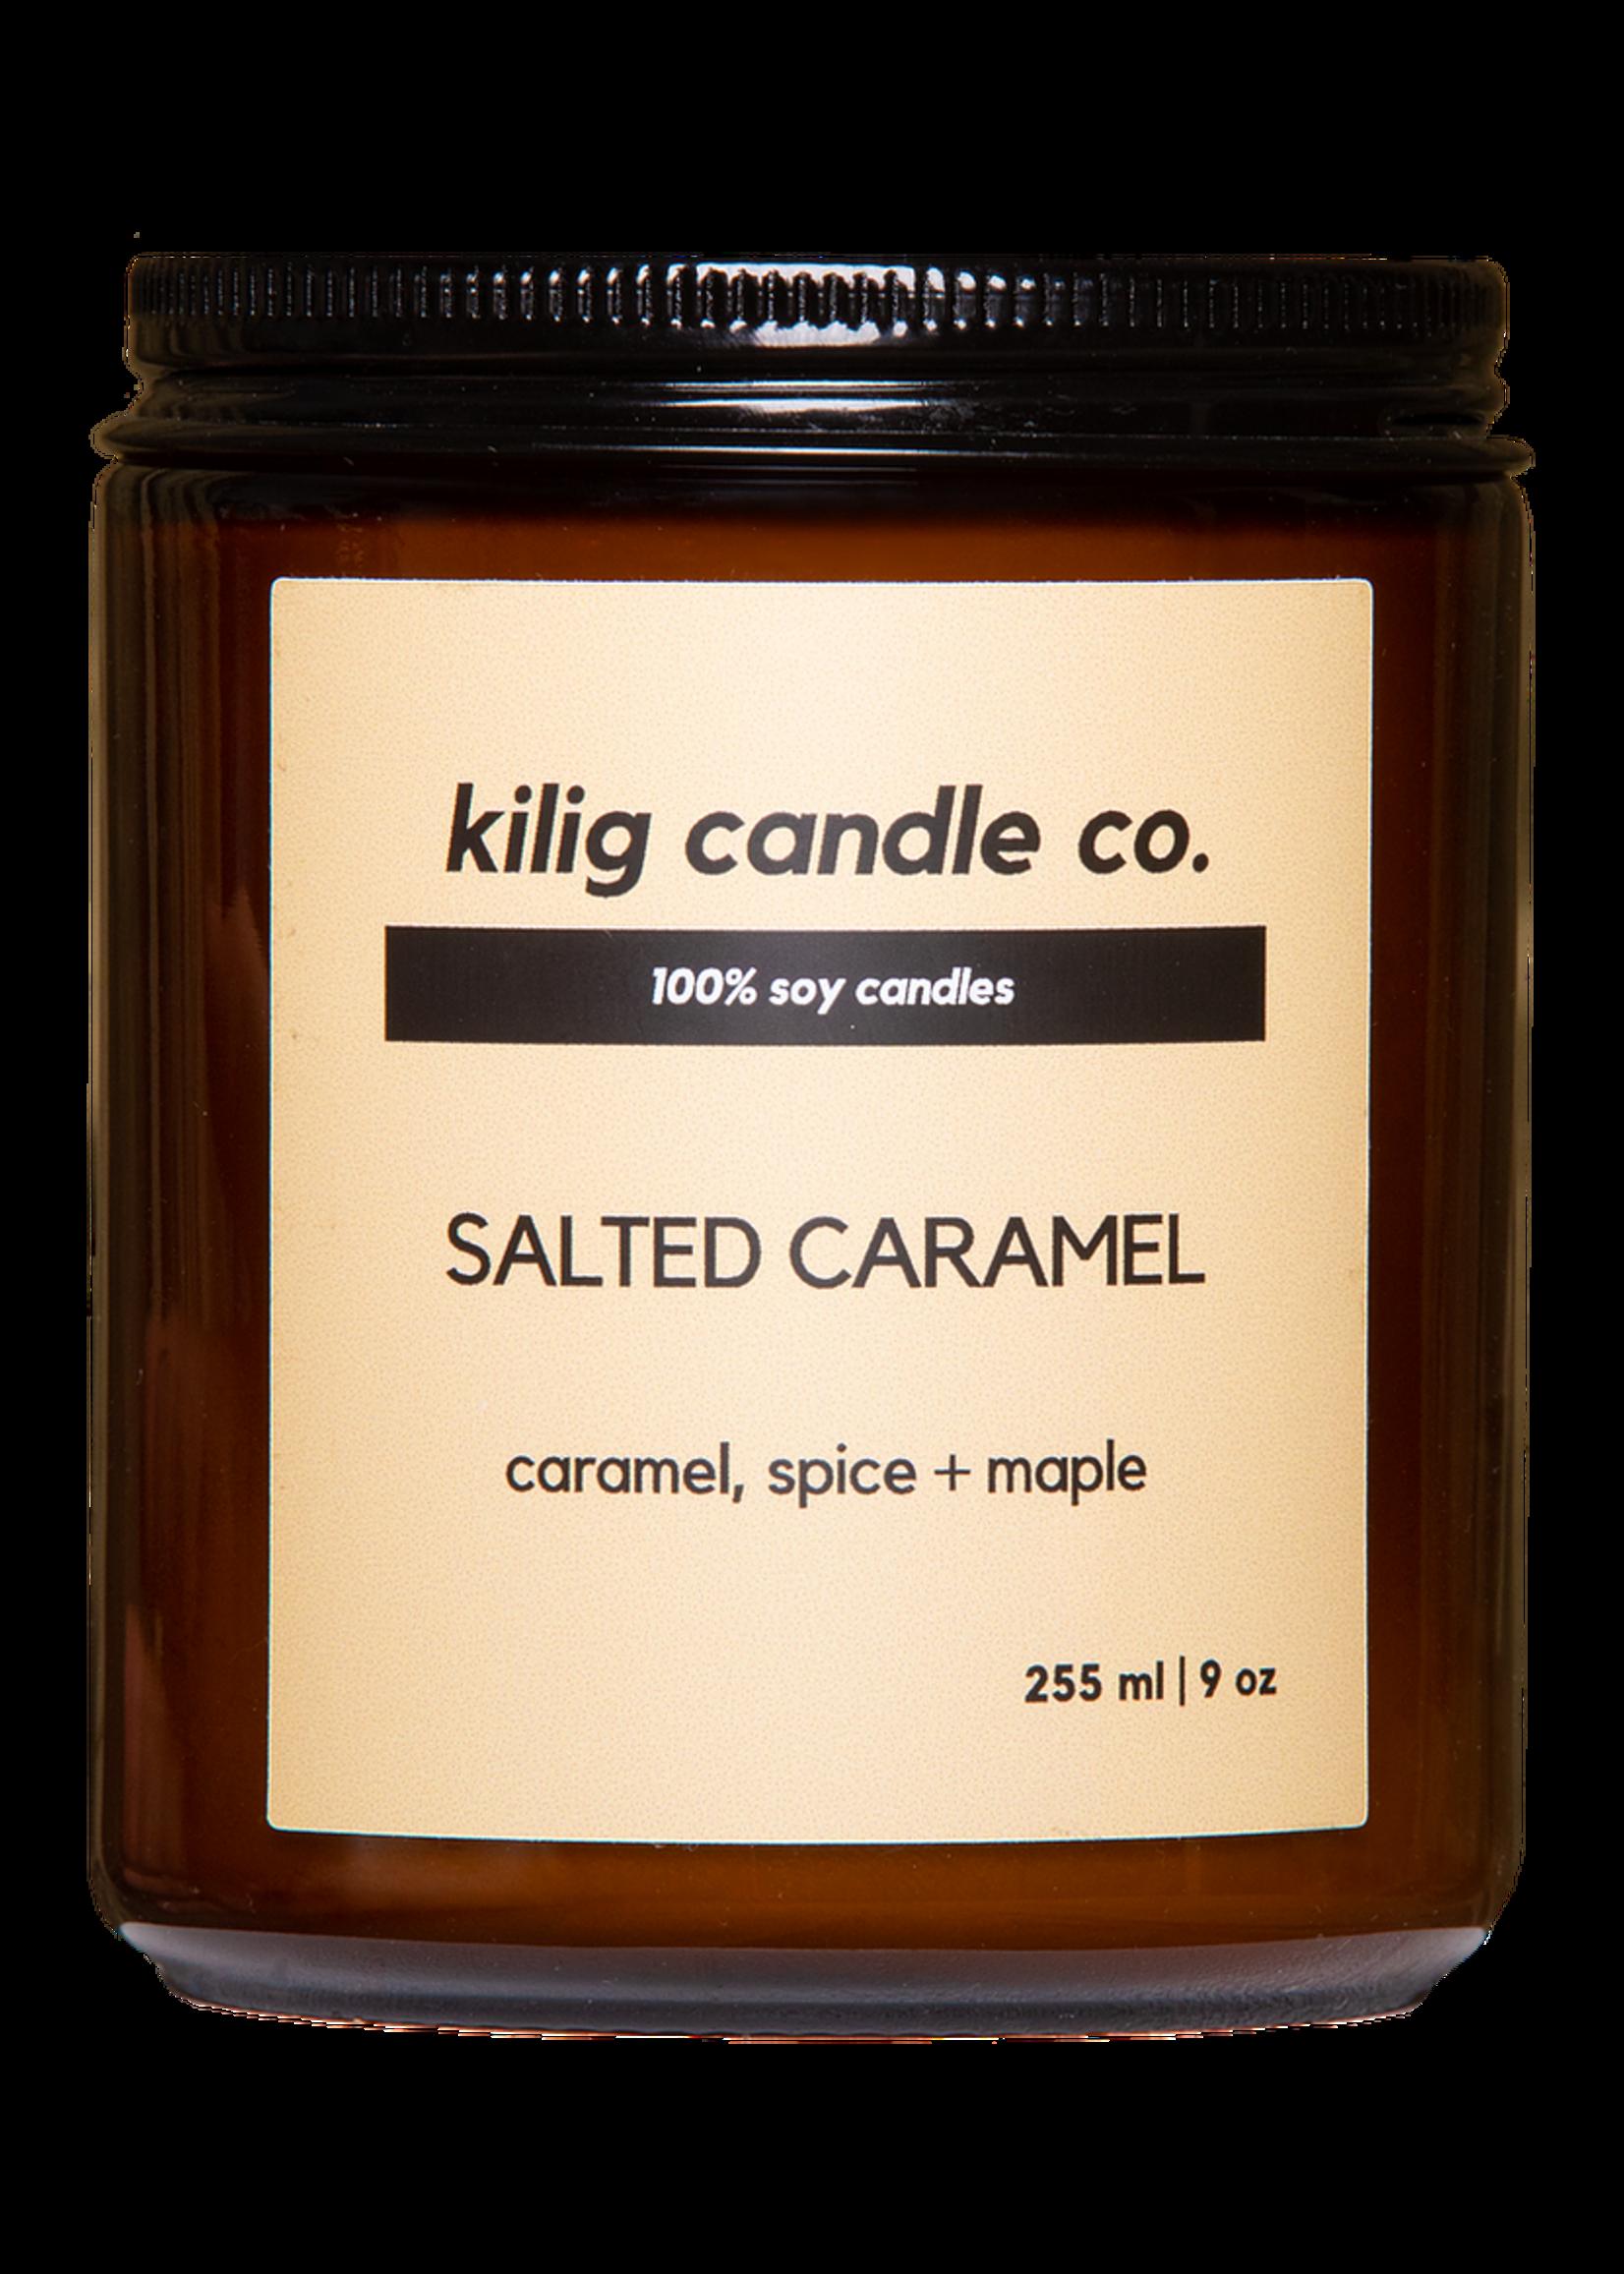 Kilig Candle Co. Salted Caramel